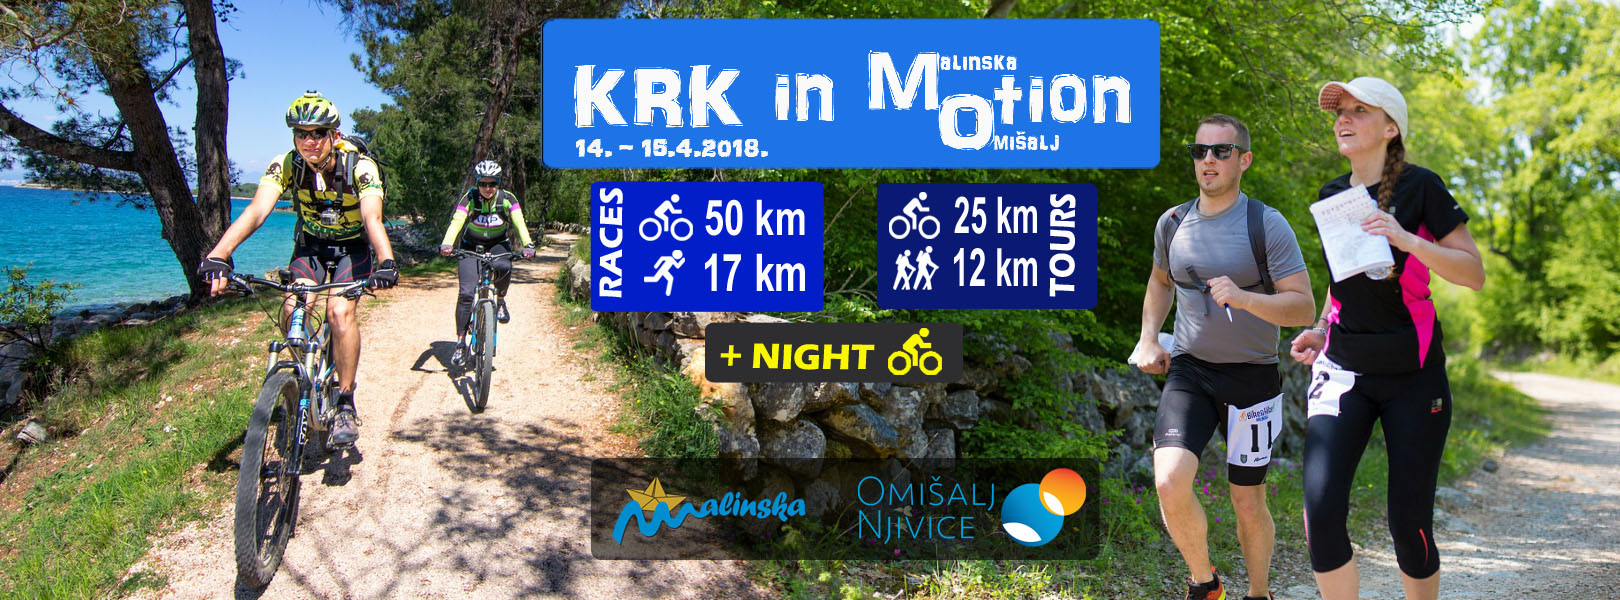 Krk in MOtion – provedite aktivan vikend u Malinskoj